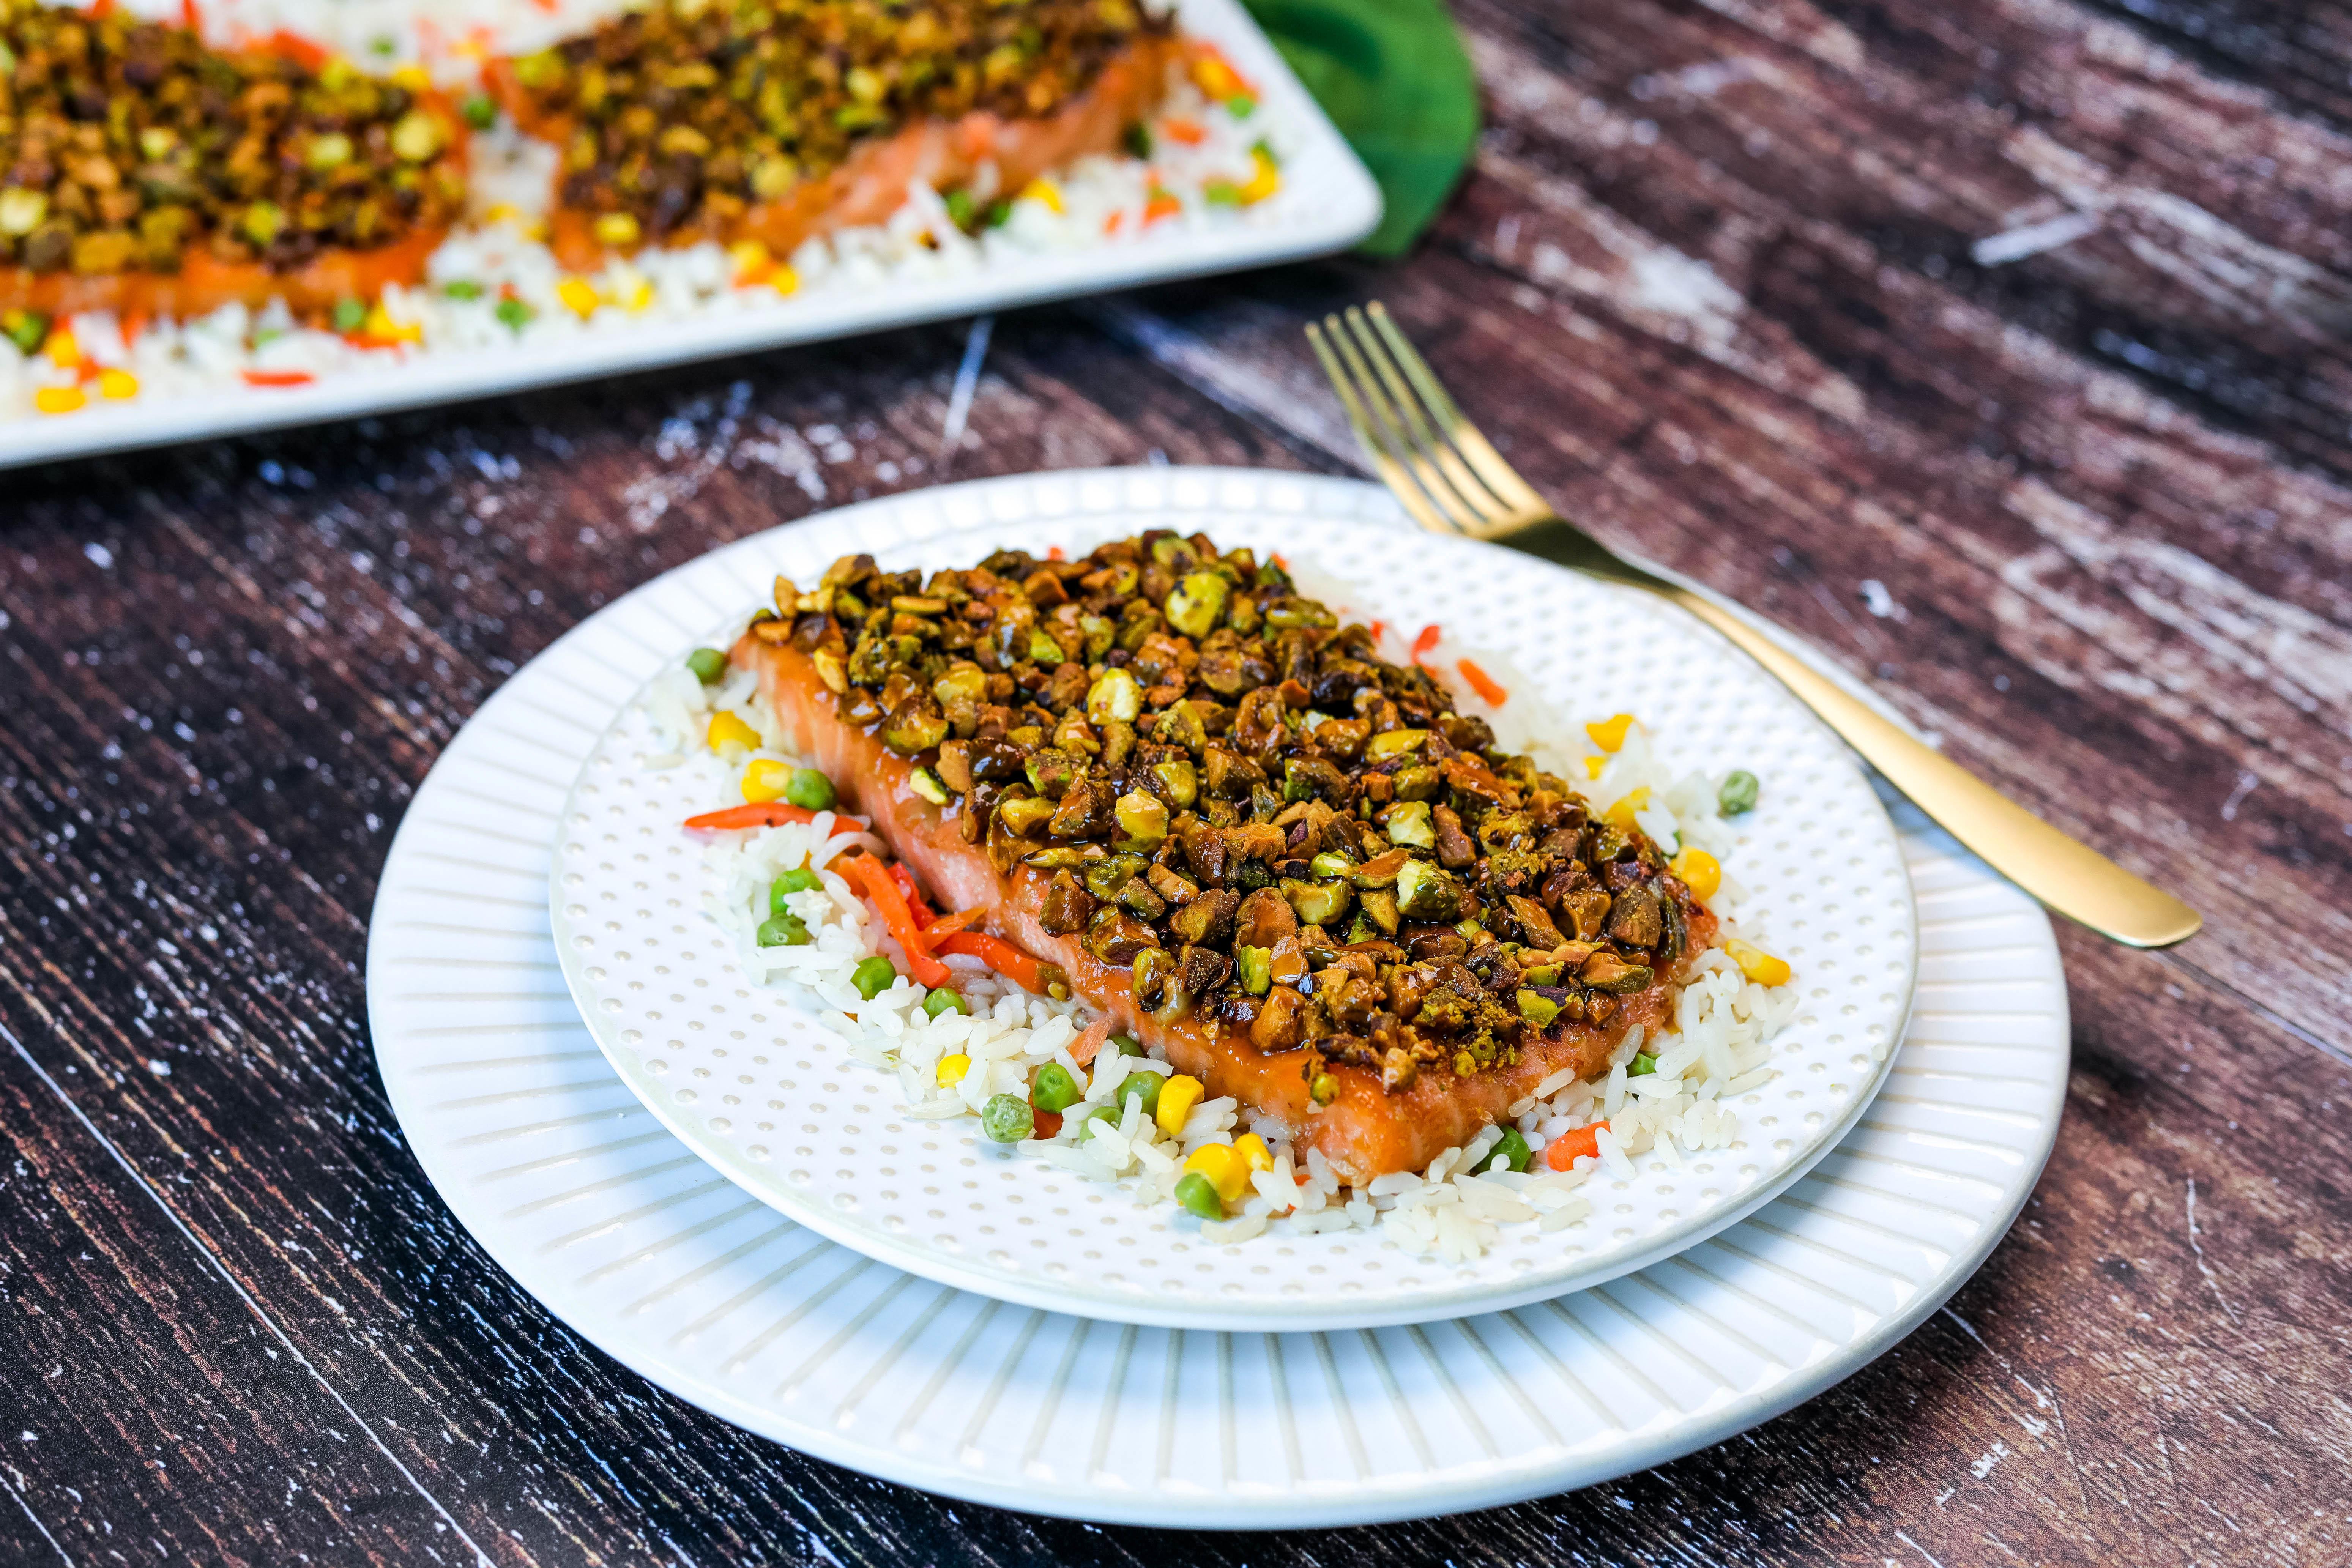 Roasted Pistachio Salmon with Maple Whiskey Sauce Recipe